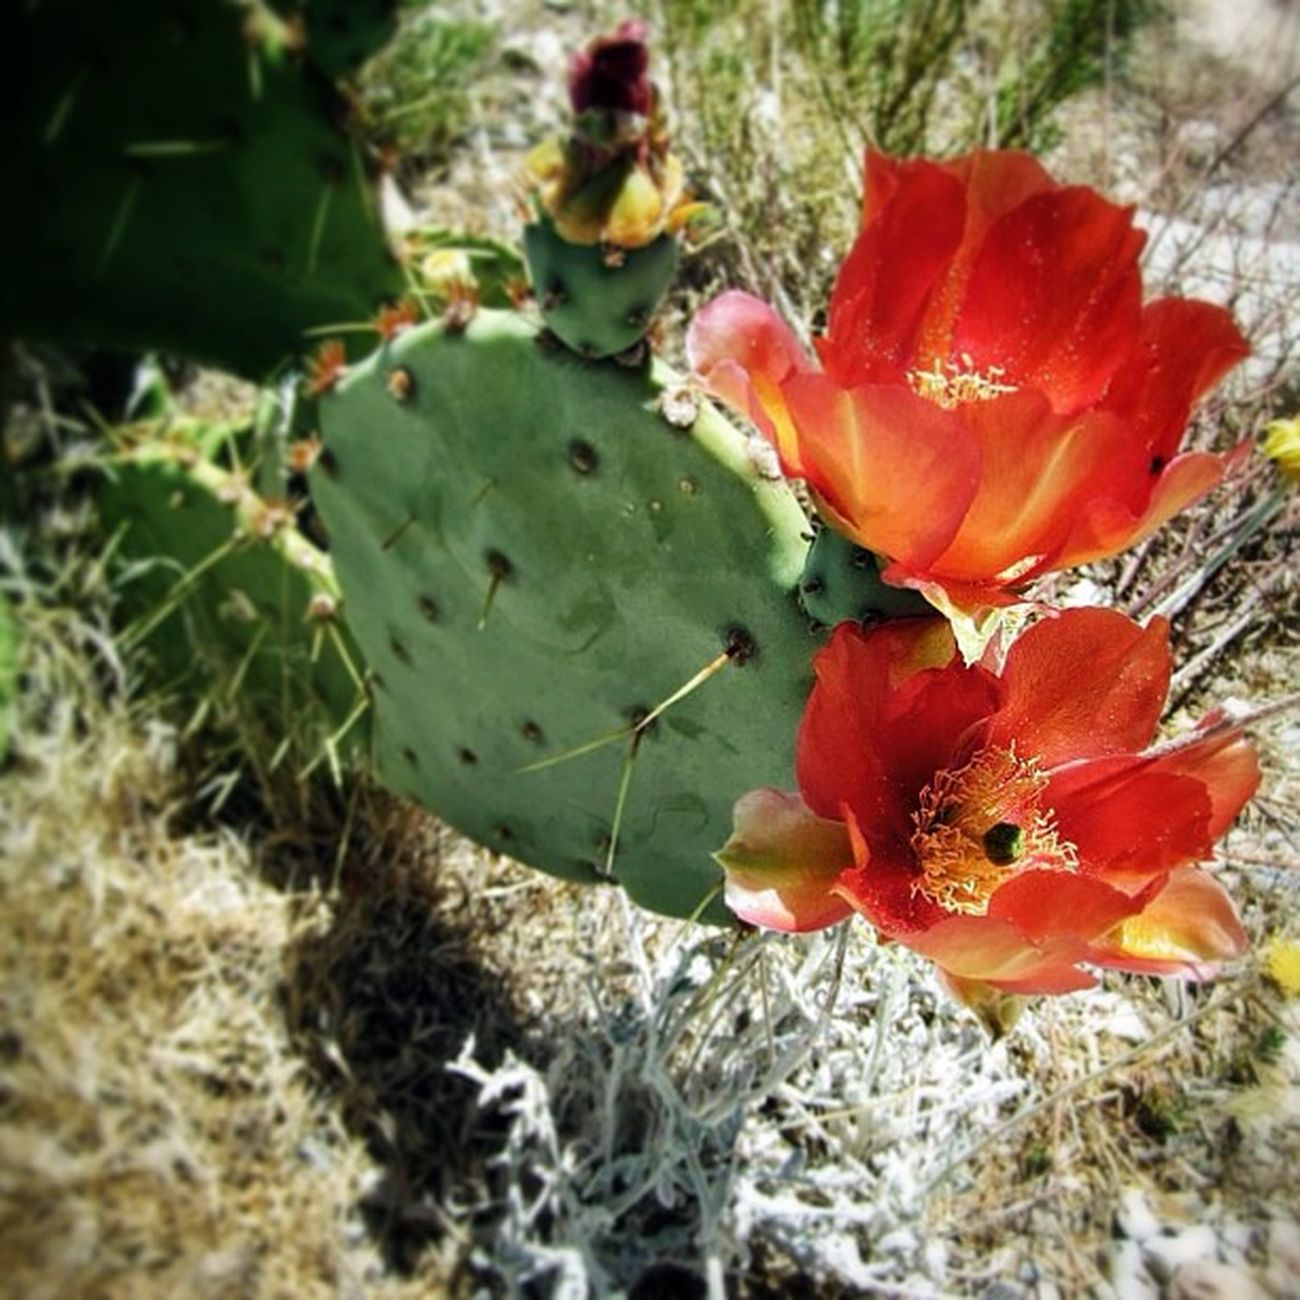 Red Rock Canyon, Nevada Redrockcanyon Nature Cactus Flower Travel USA Outdoors Rock Nevada Redrock Nationalpark Honktravel